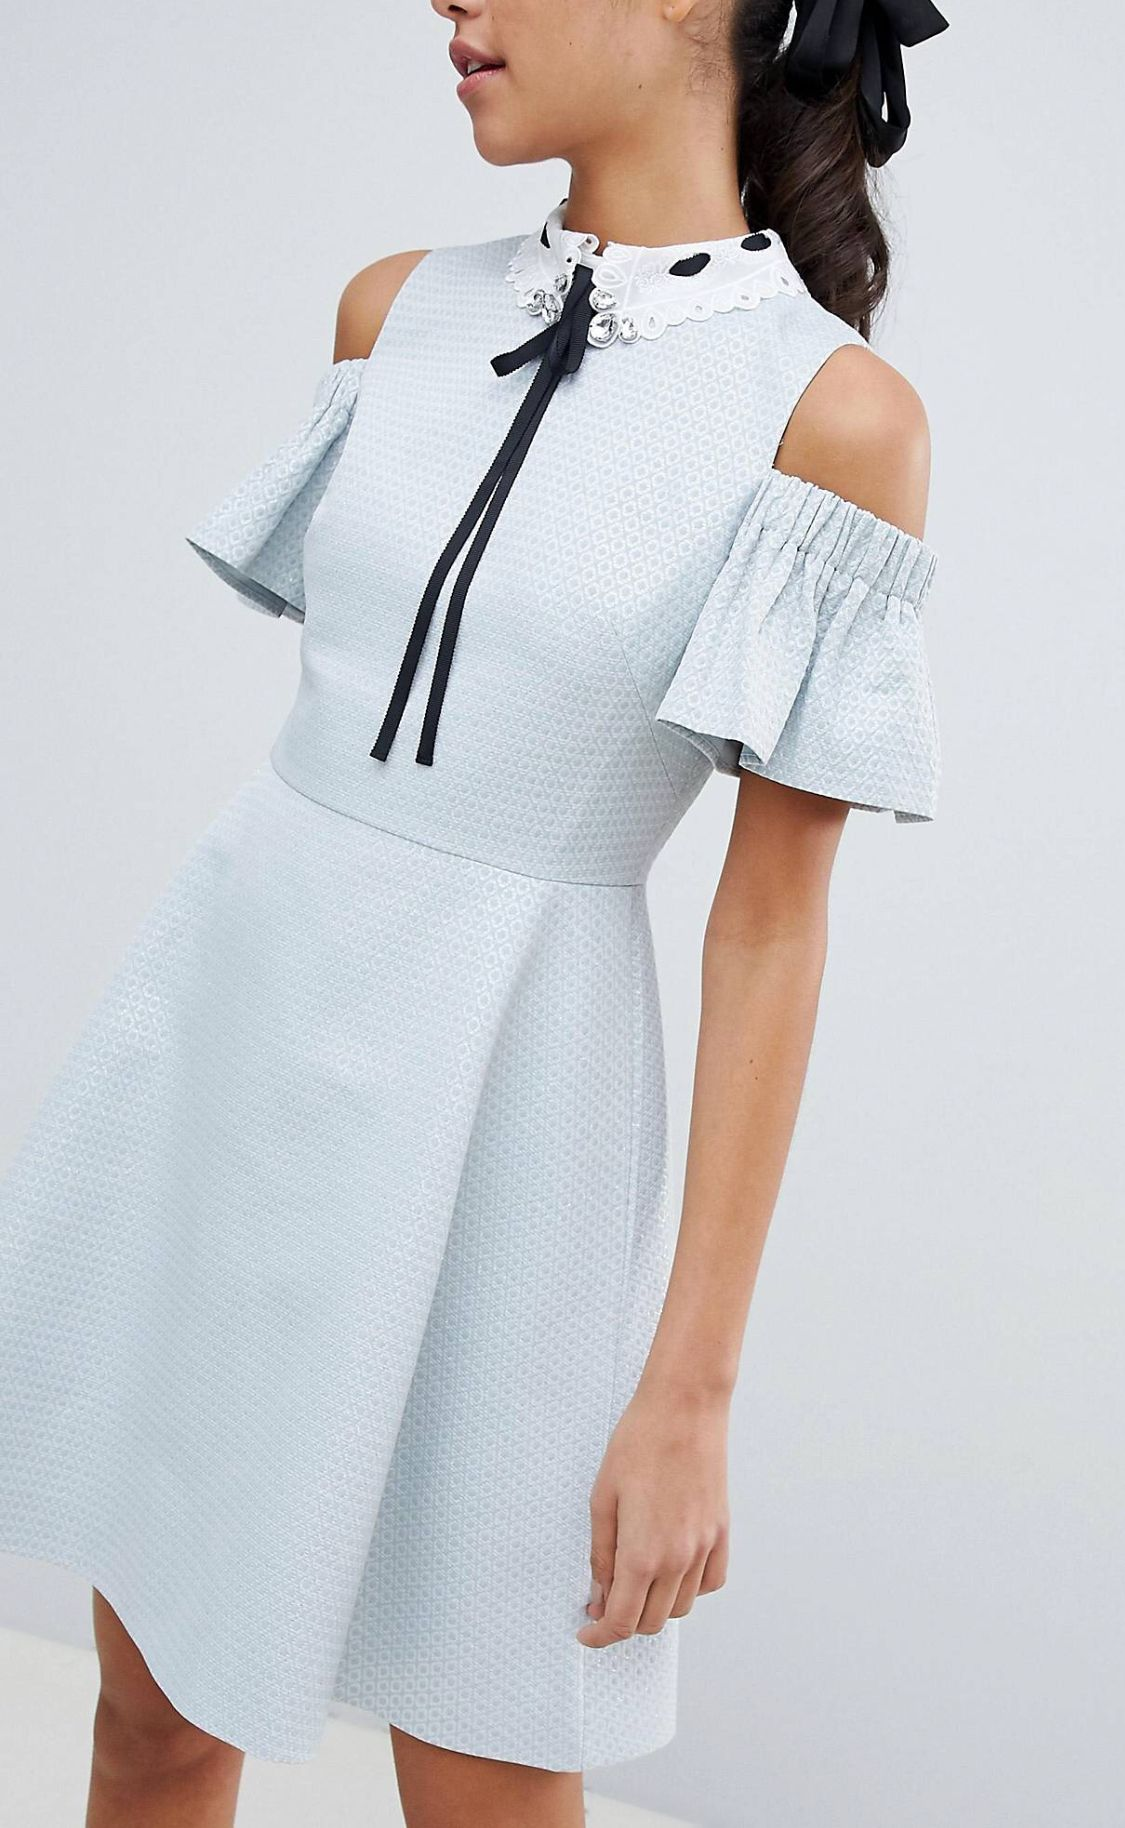 Pin by małgorzata bobrowska on trendy pinterest indian designer